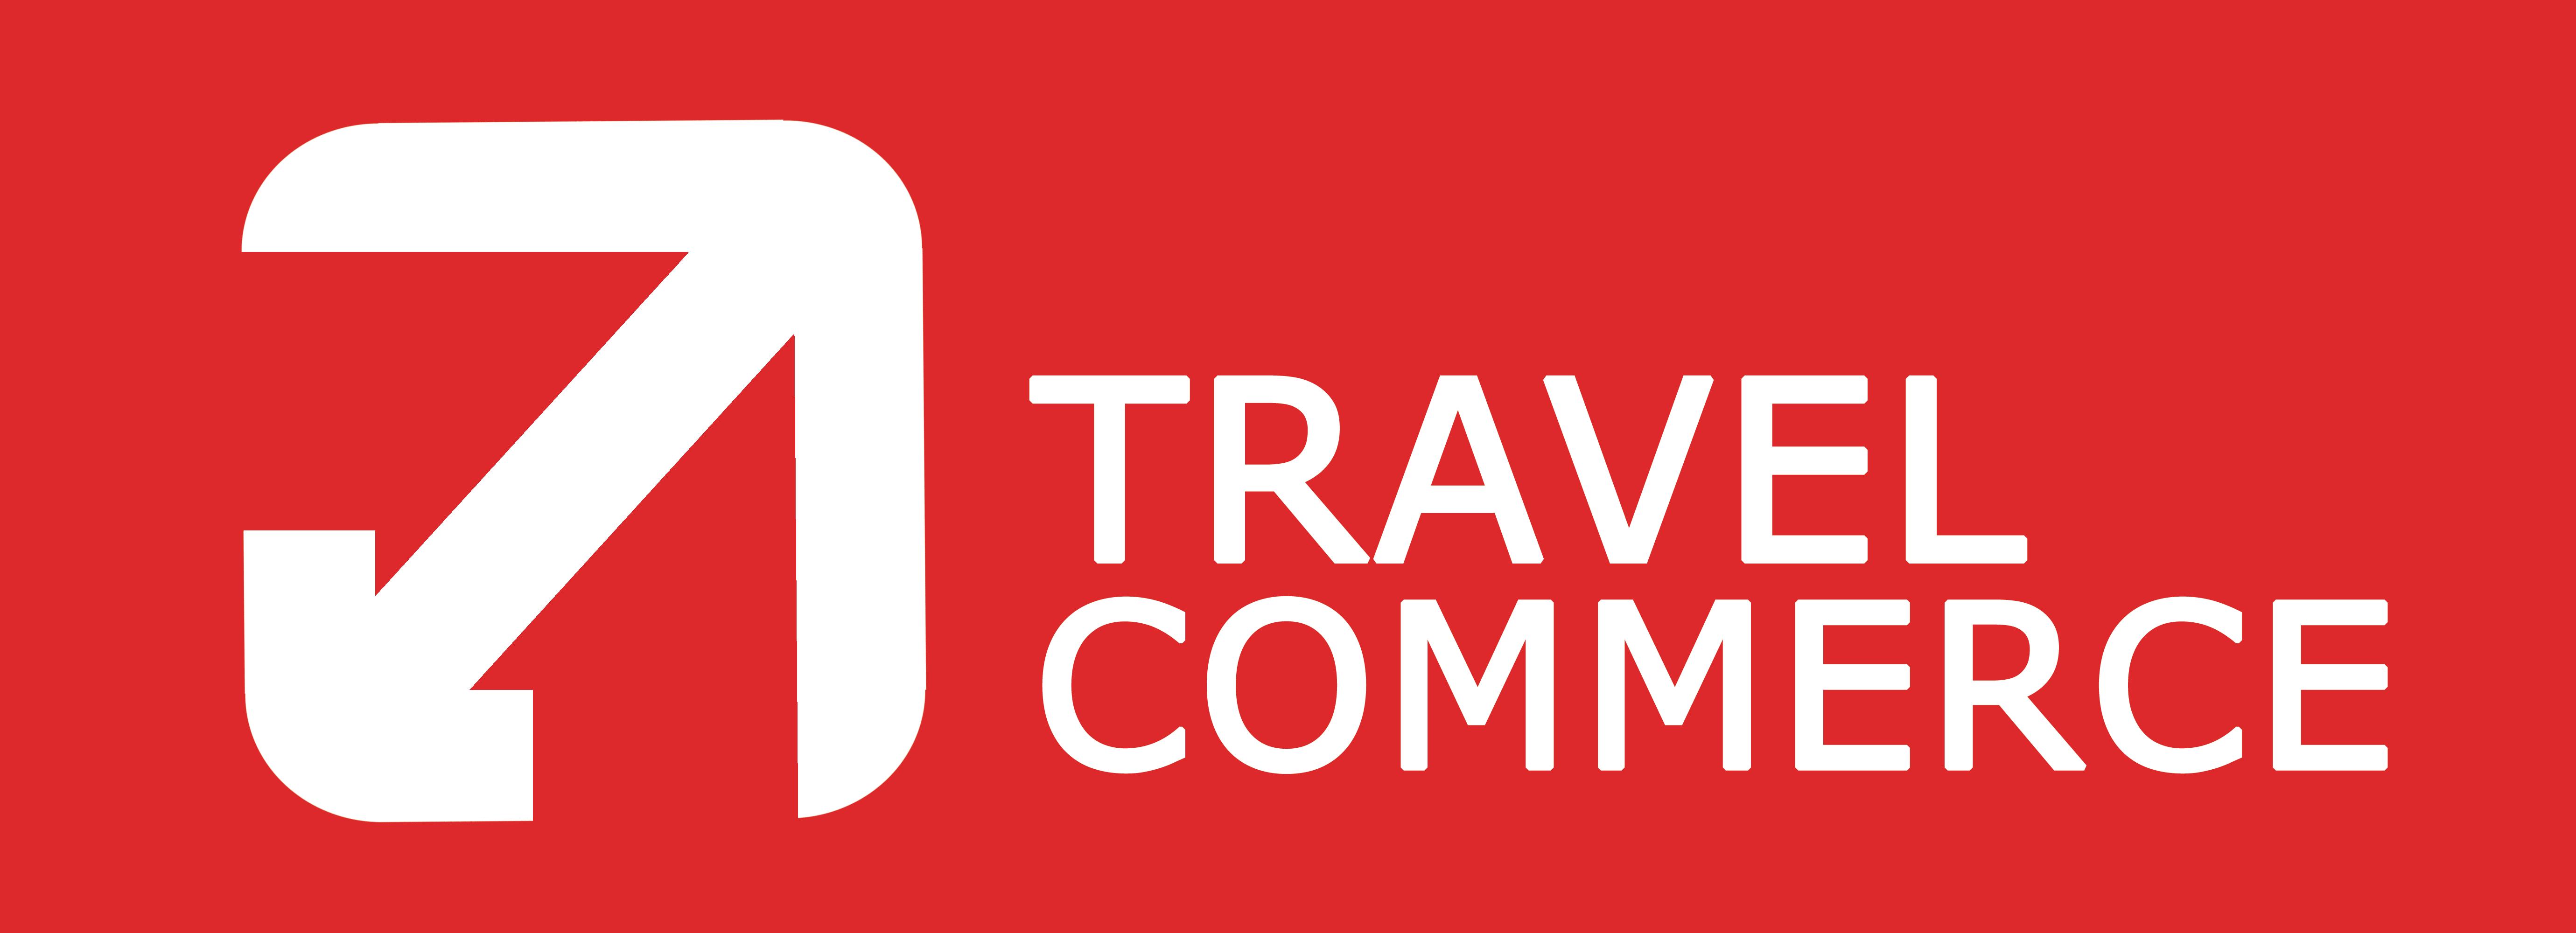 Travel Commerce